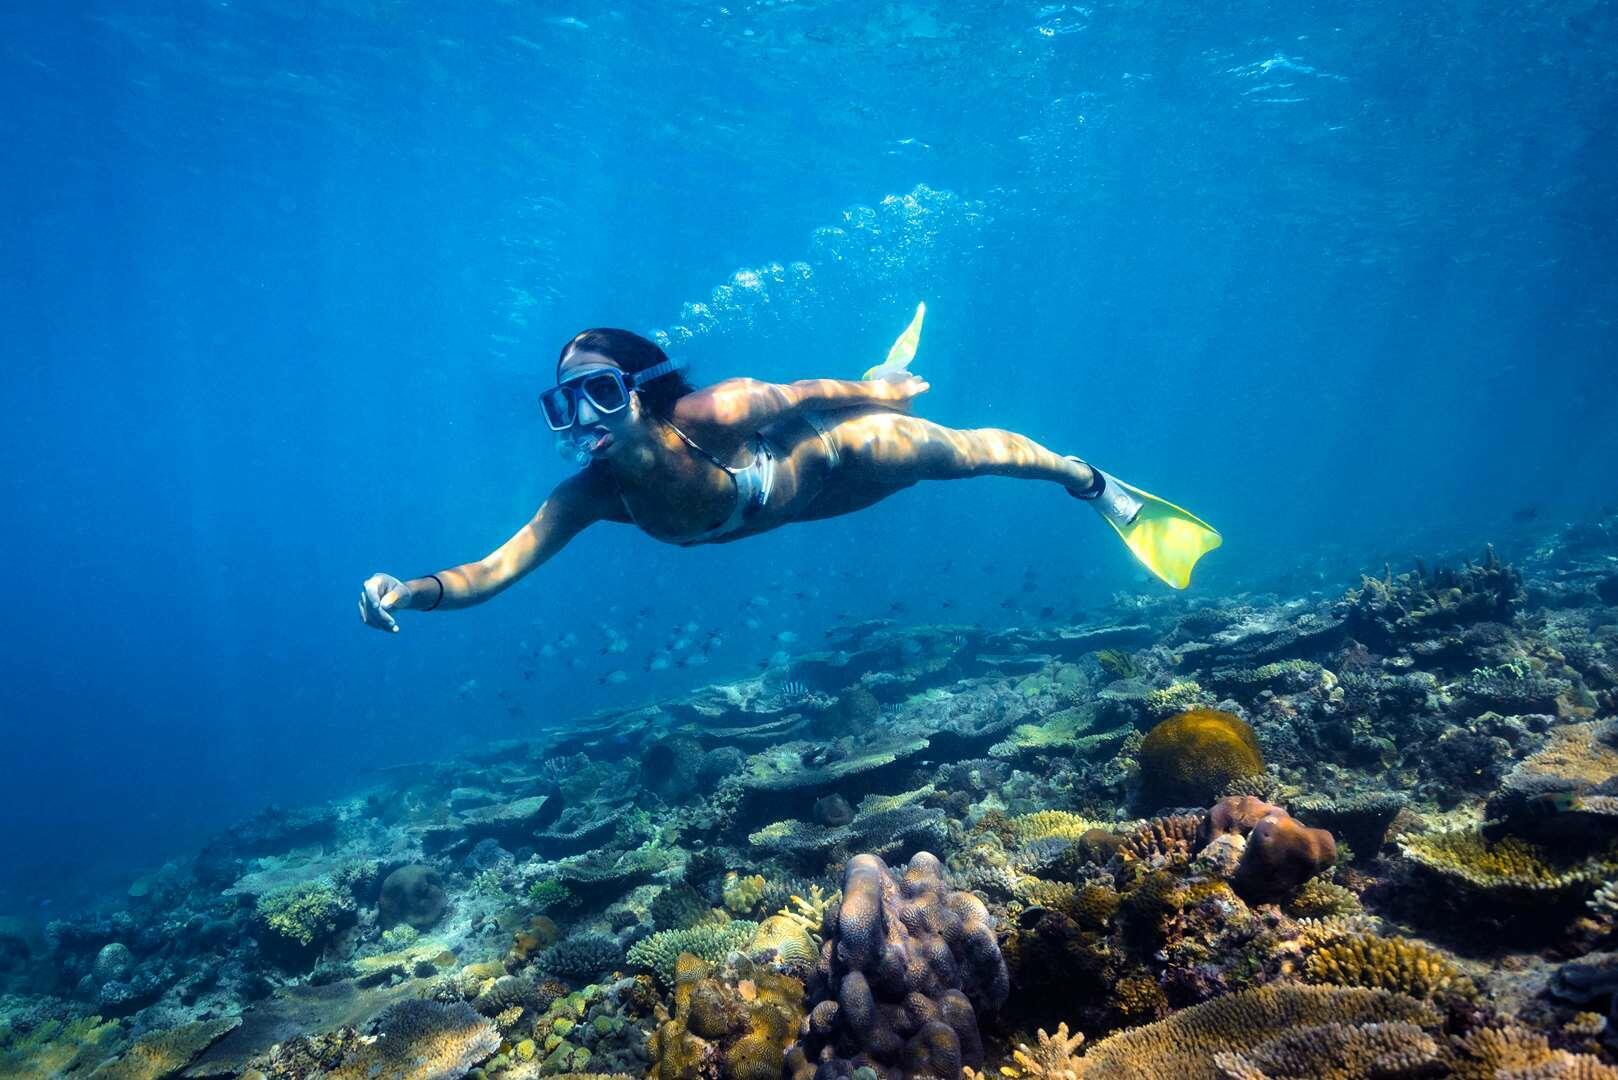 Water Activities at Heron Reef